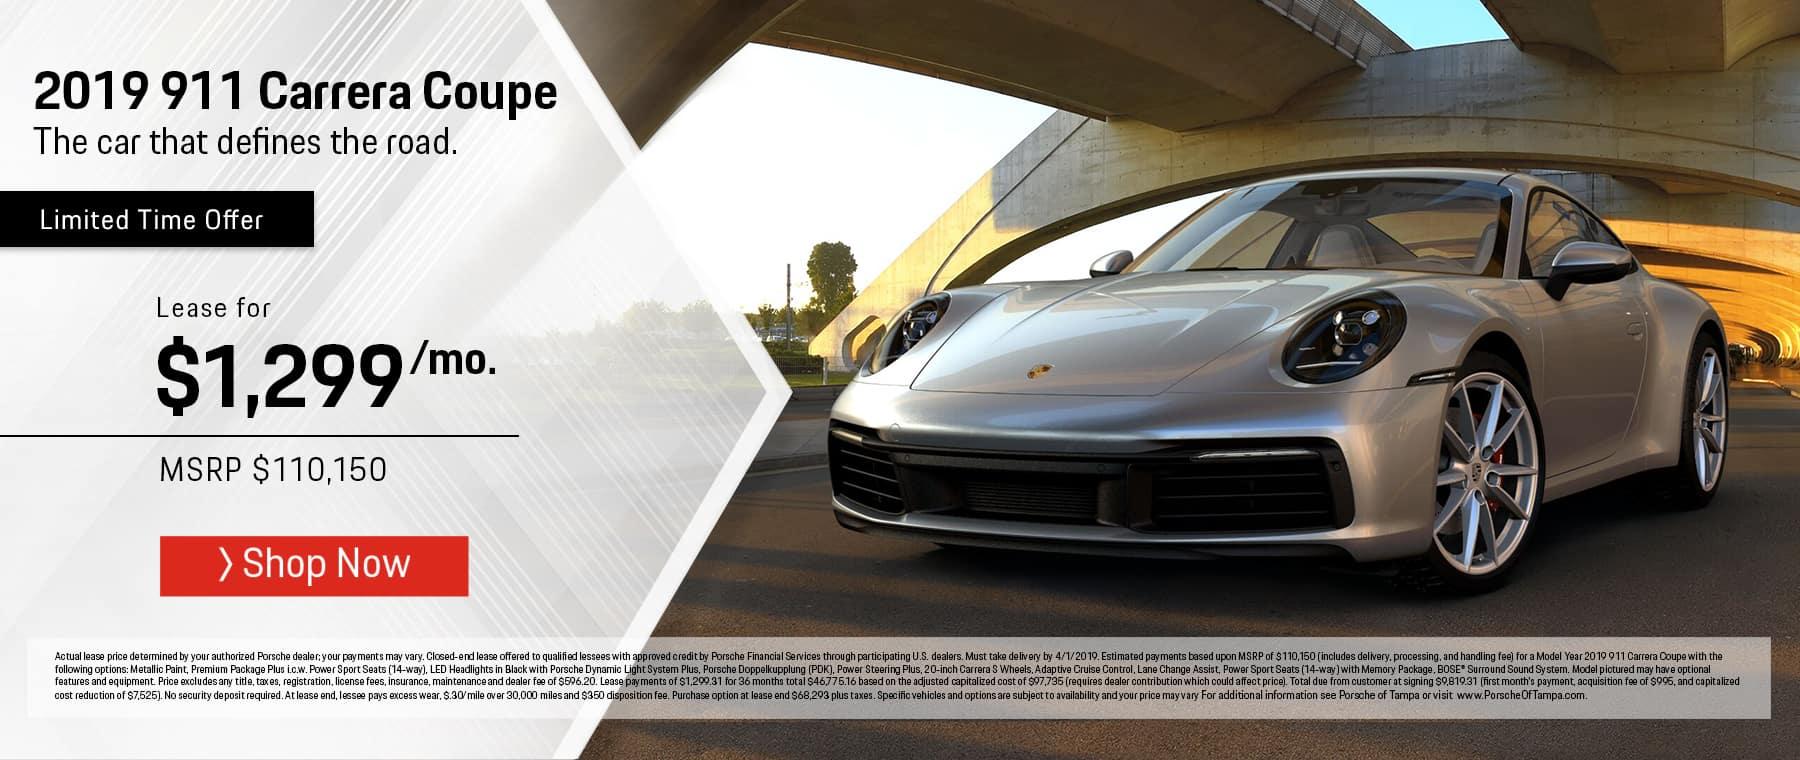 January Porsche 911 Carrera